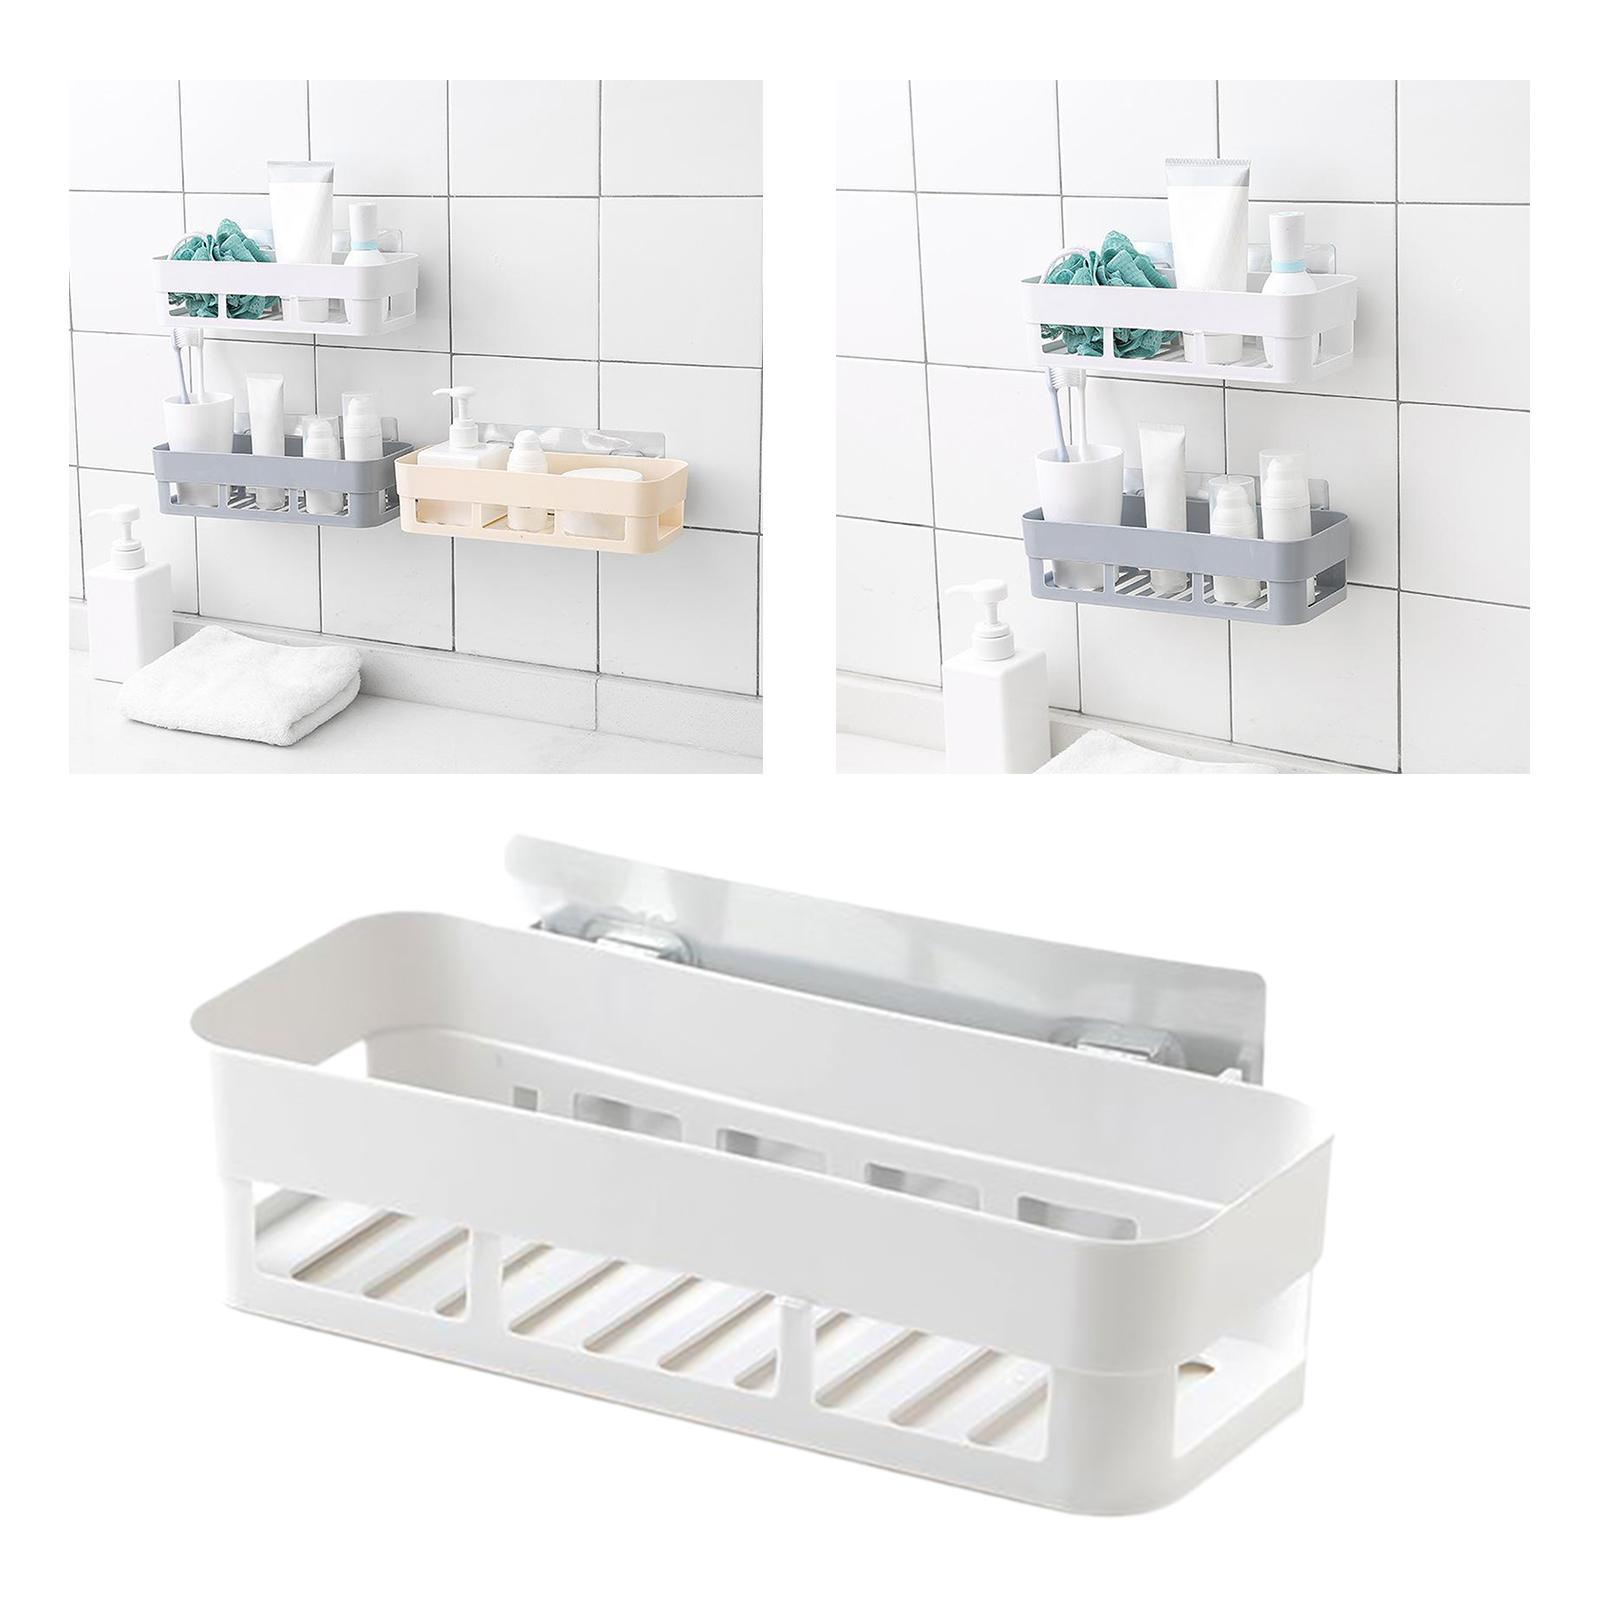 thumbnail 10 - Wall-Suction-Bathroom-Shelf-Shower-Caddy-Wall-Mount-Storage-Rack-Organizer